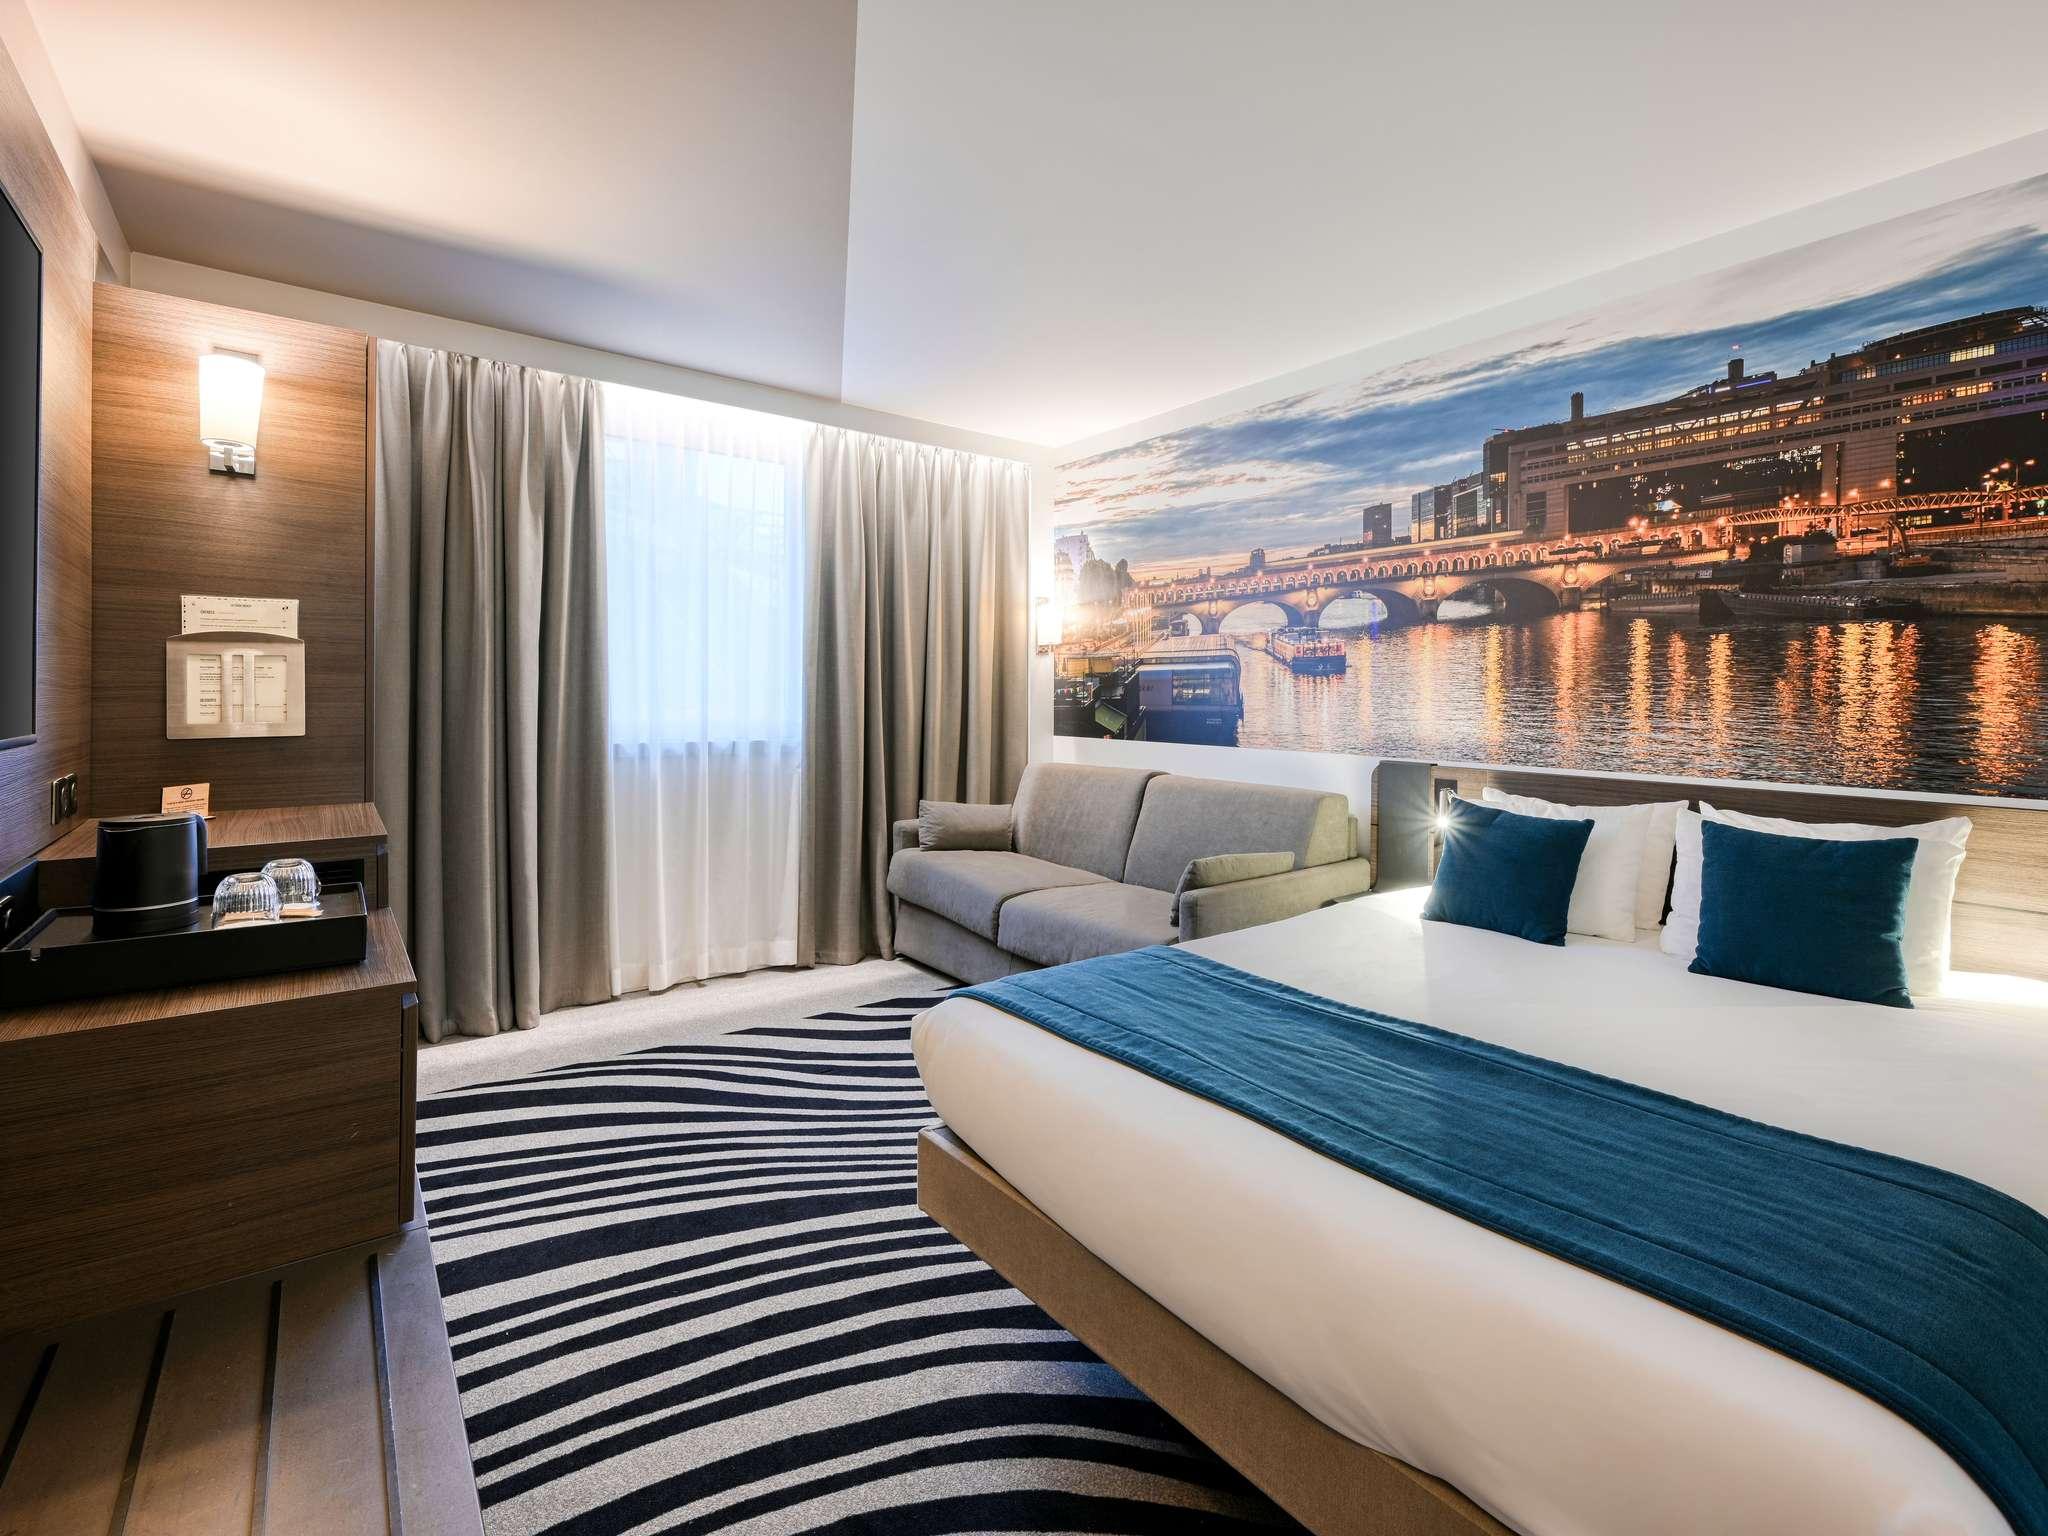 Hotel - Novotel Paris Centre Bercy